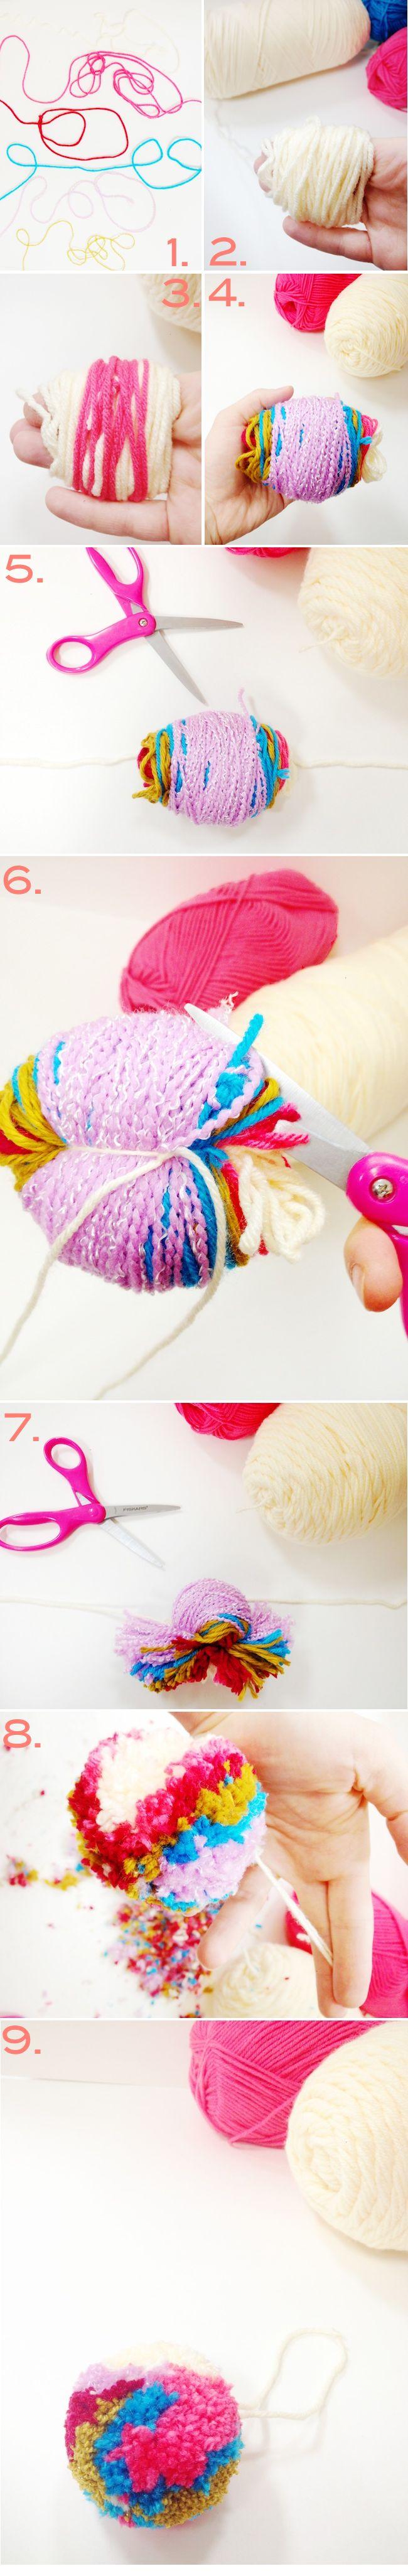 DIY: colorful yarn pom pom